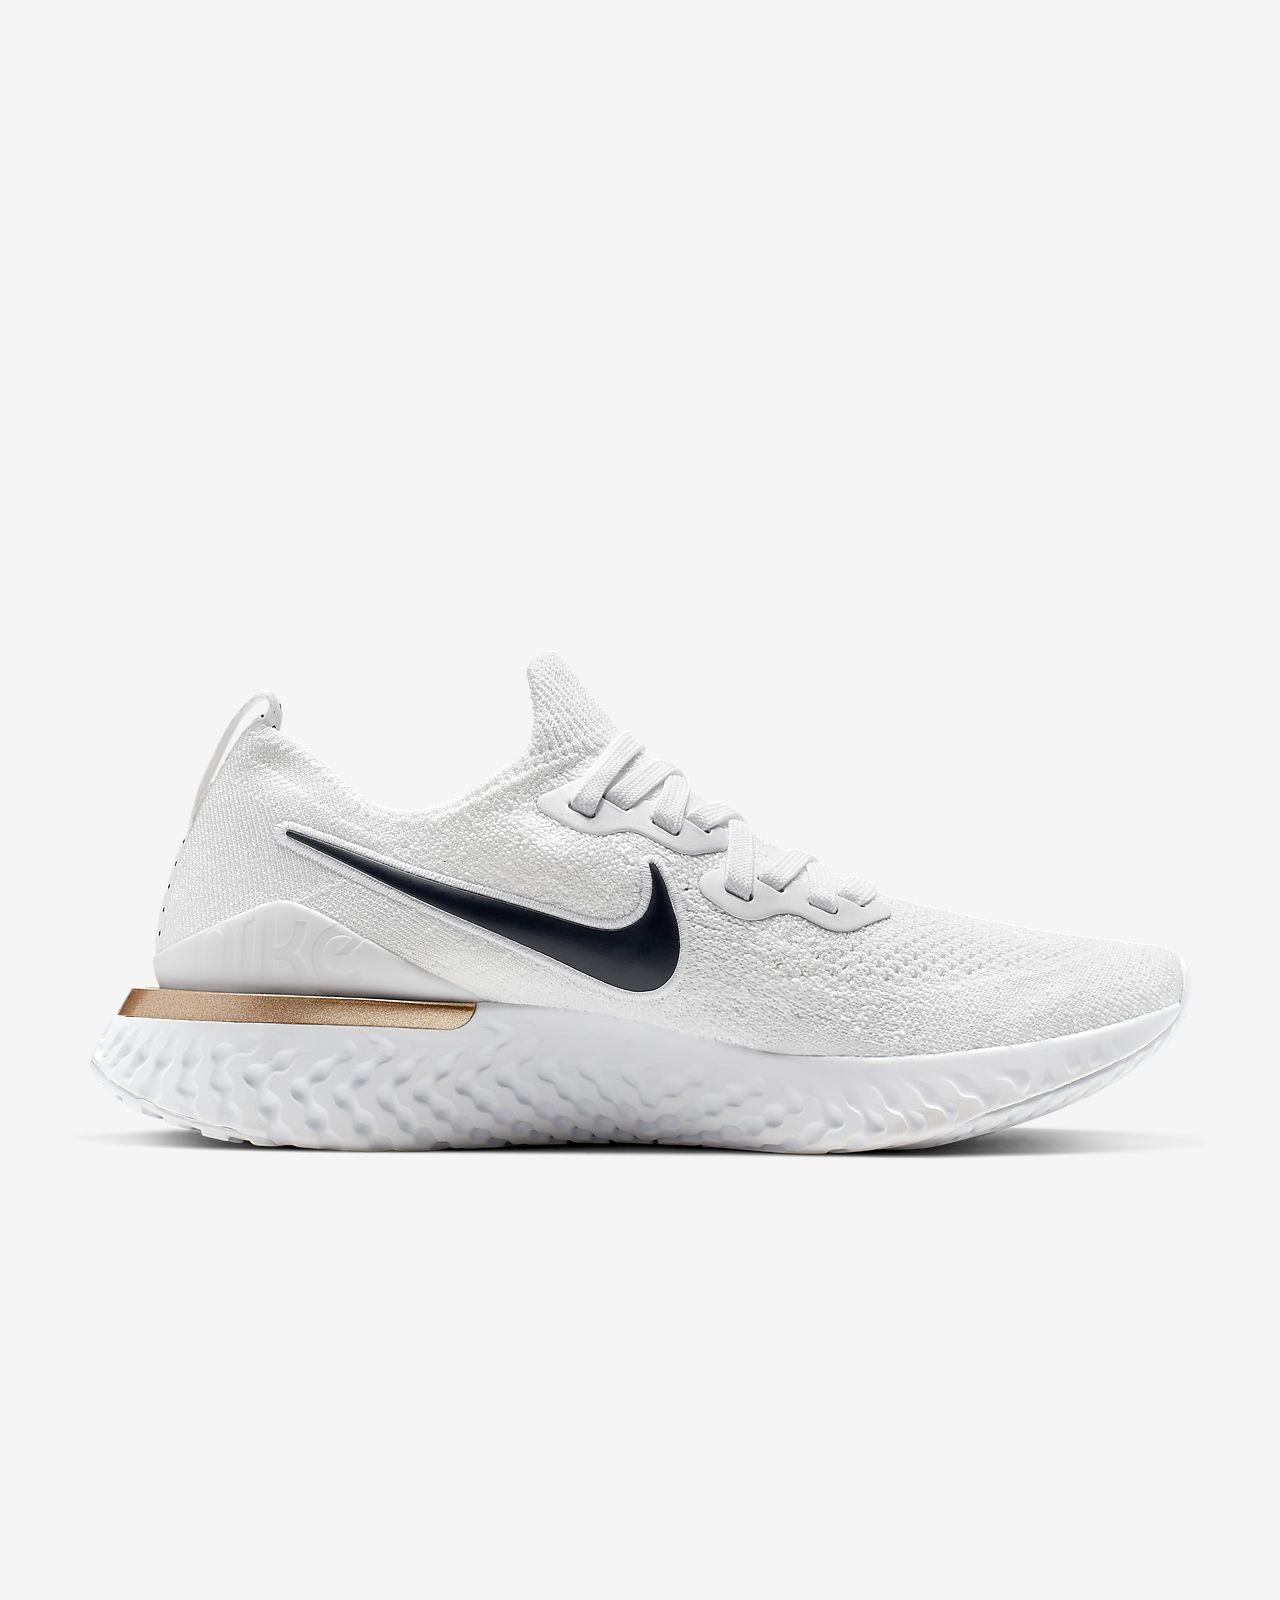 Nike Epic React Flyknit 2 Unité Totale Women's Running Shoe